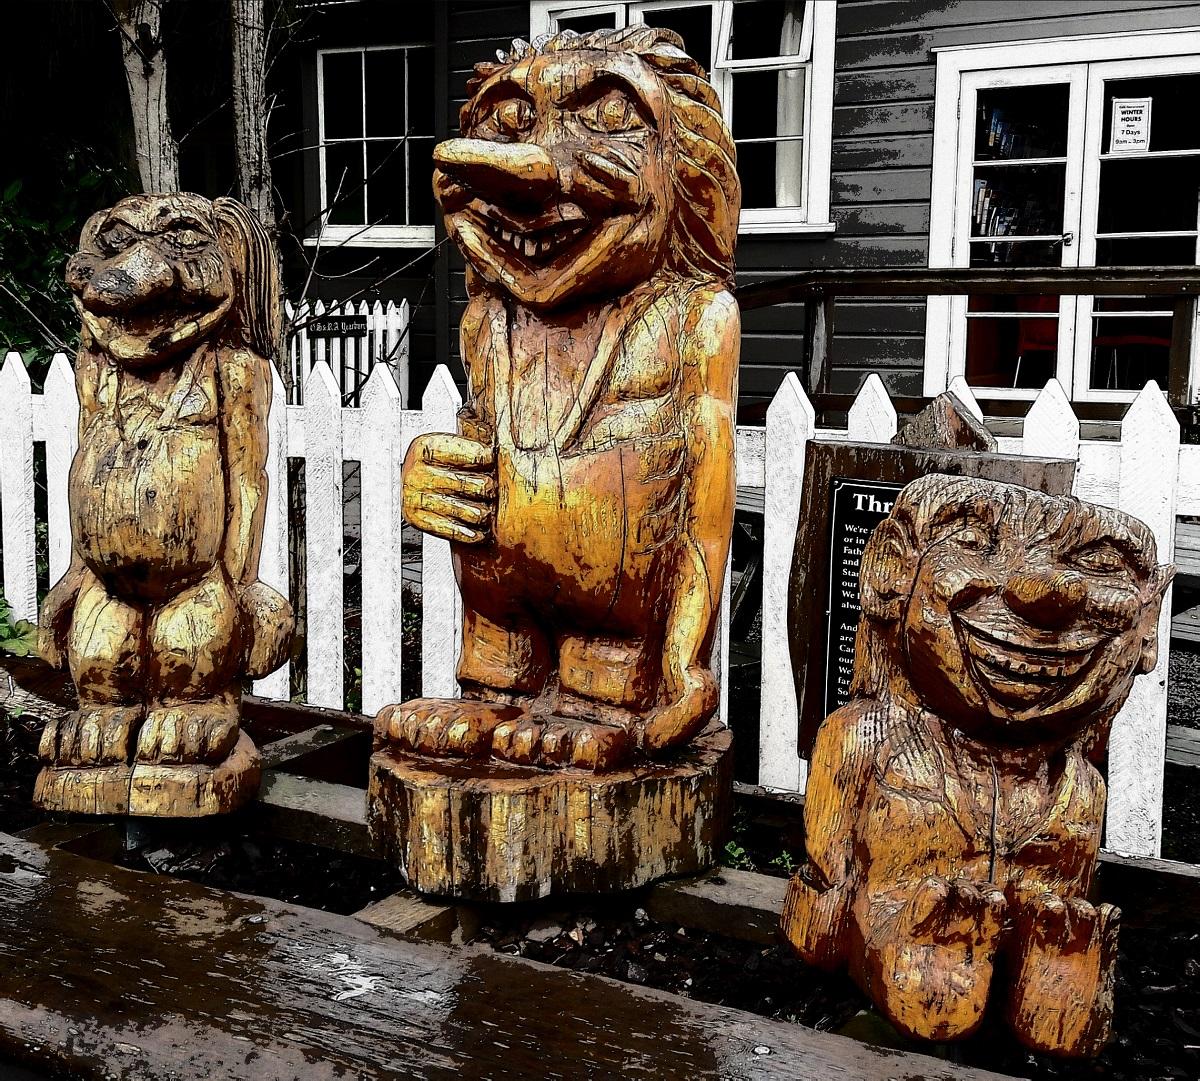 Vikings, Trolls and a Magical Gateway | POMS AWAY!